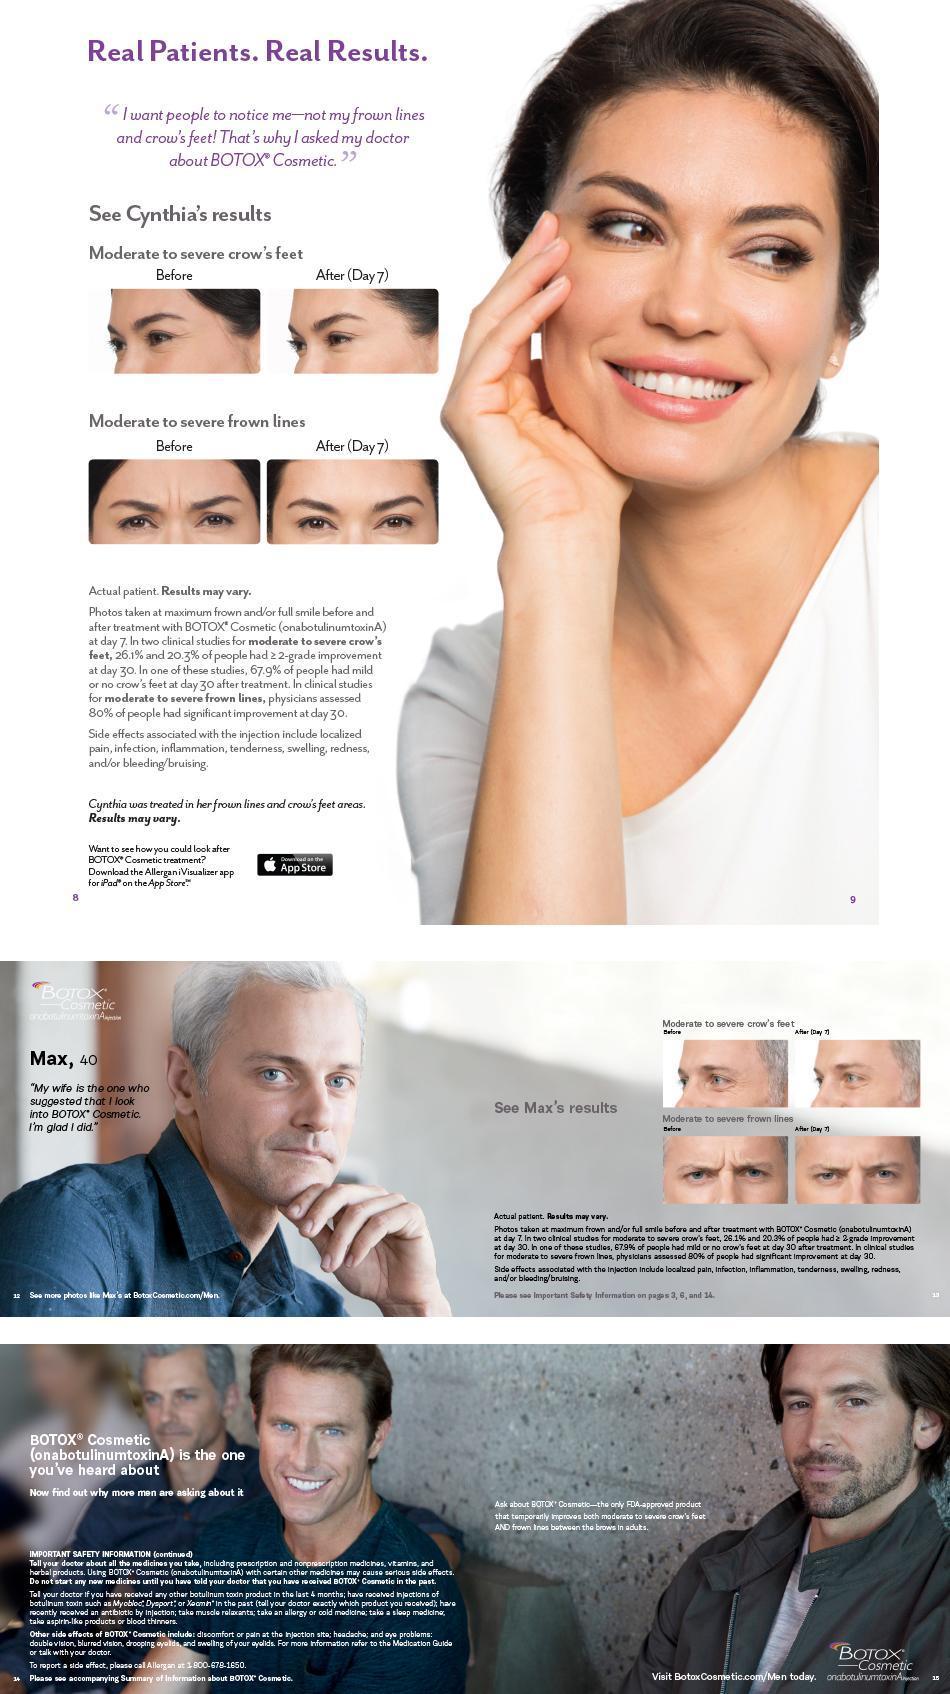 Botox Specialist - Los Angeles Beverly Hills, CA: Moris